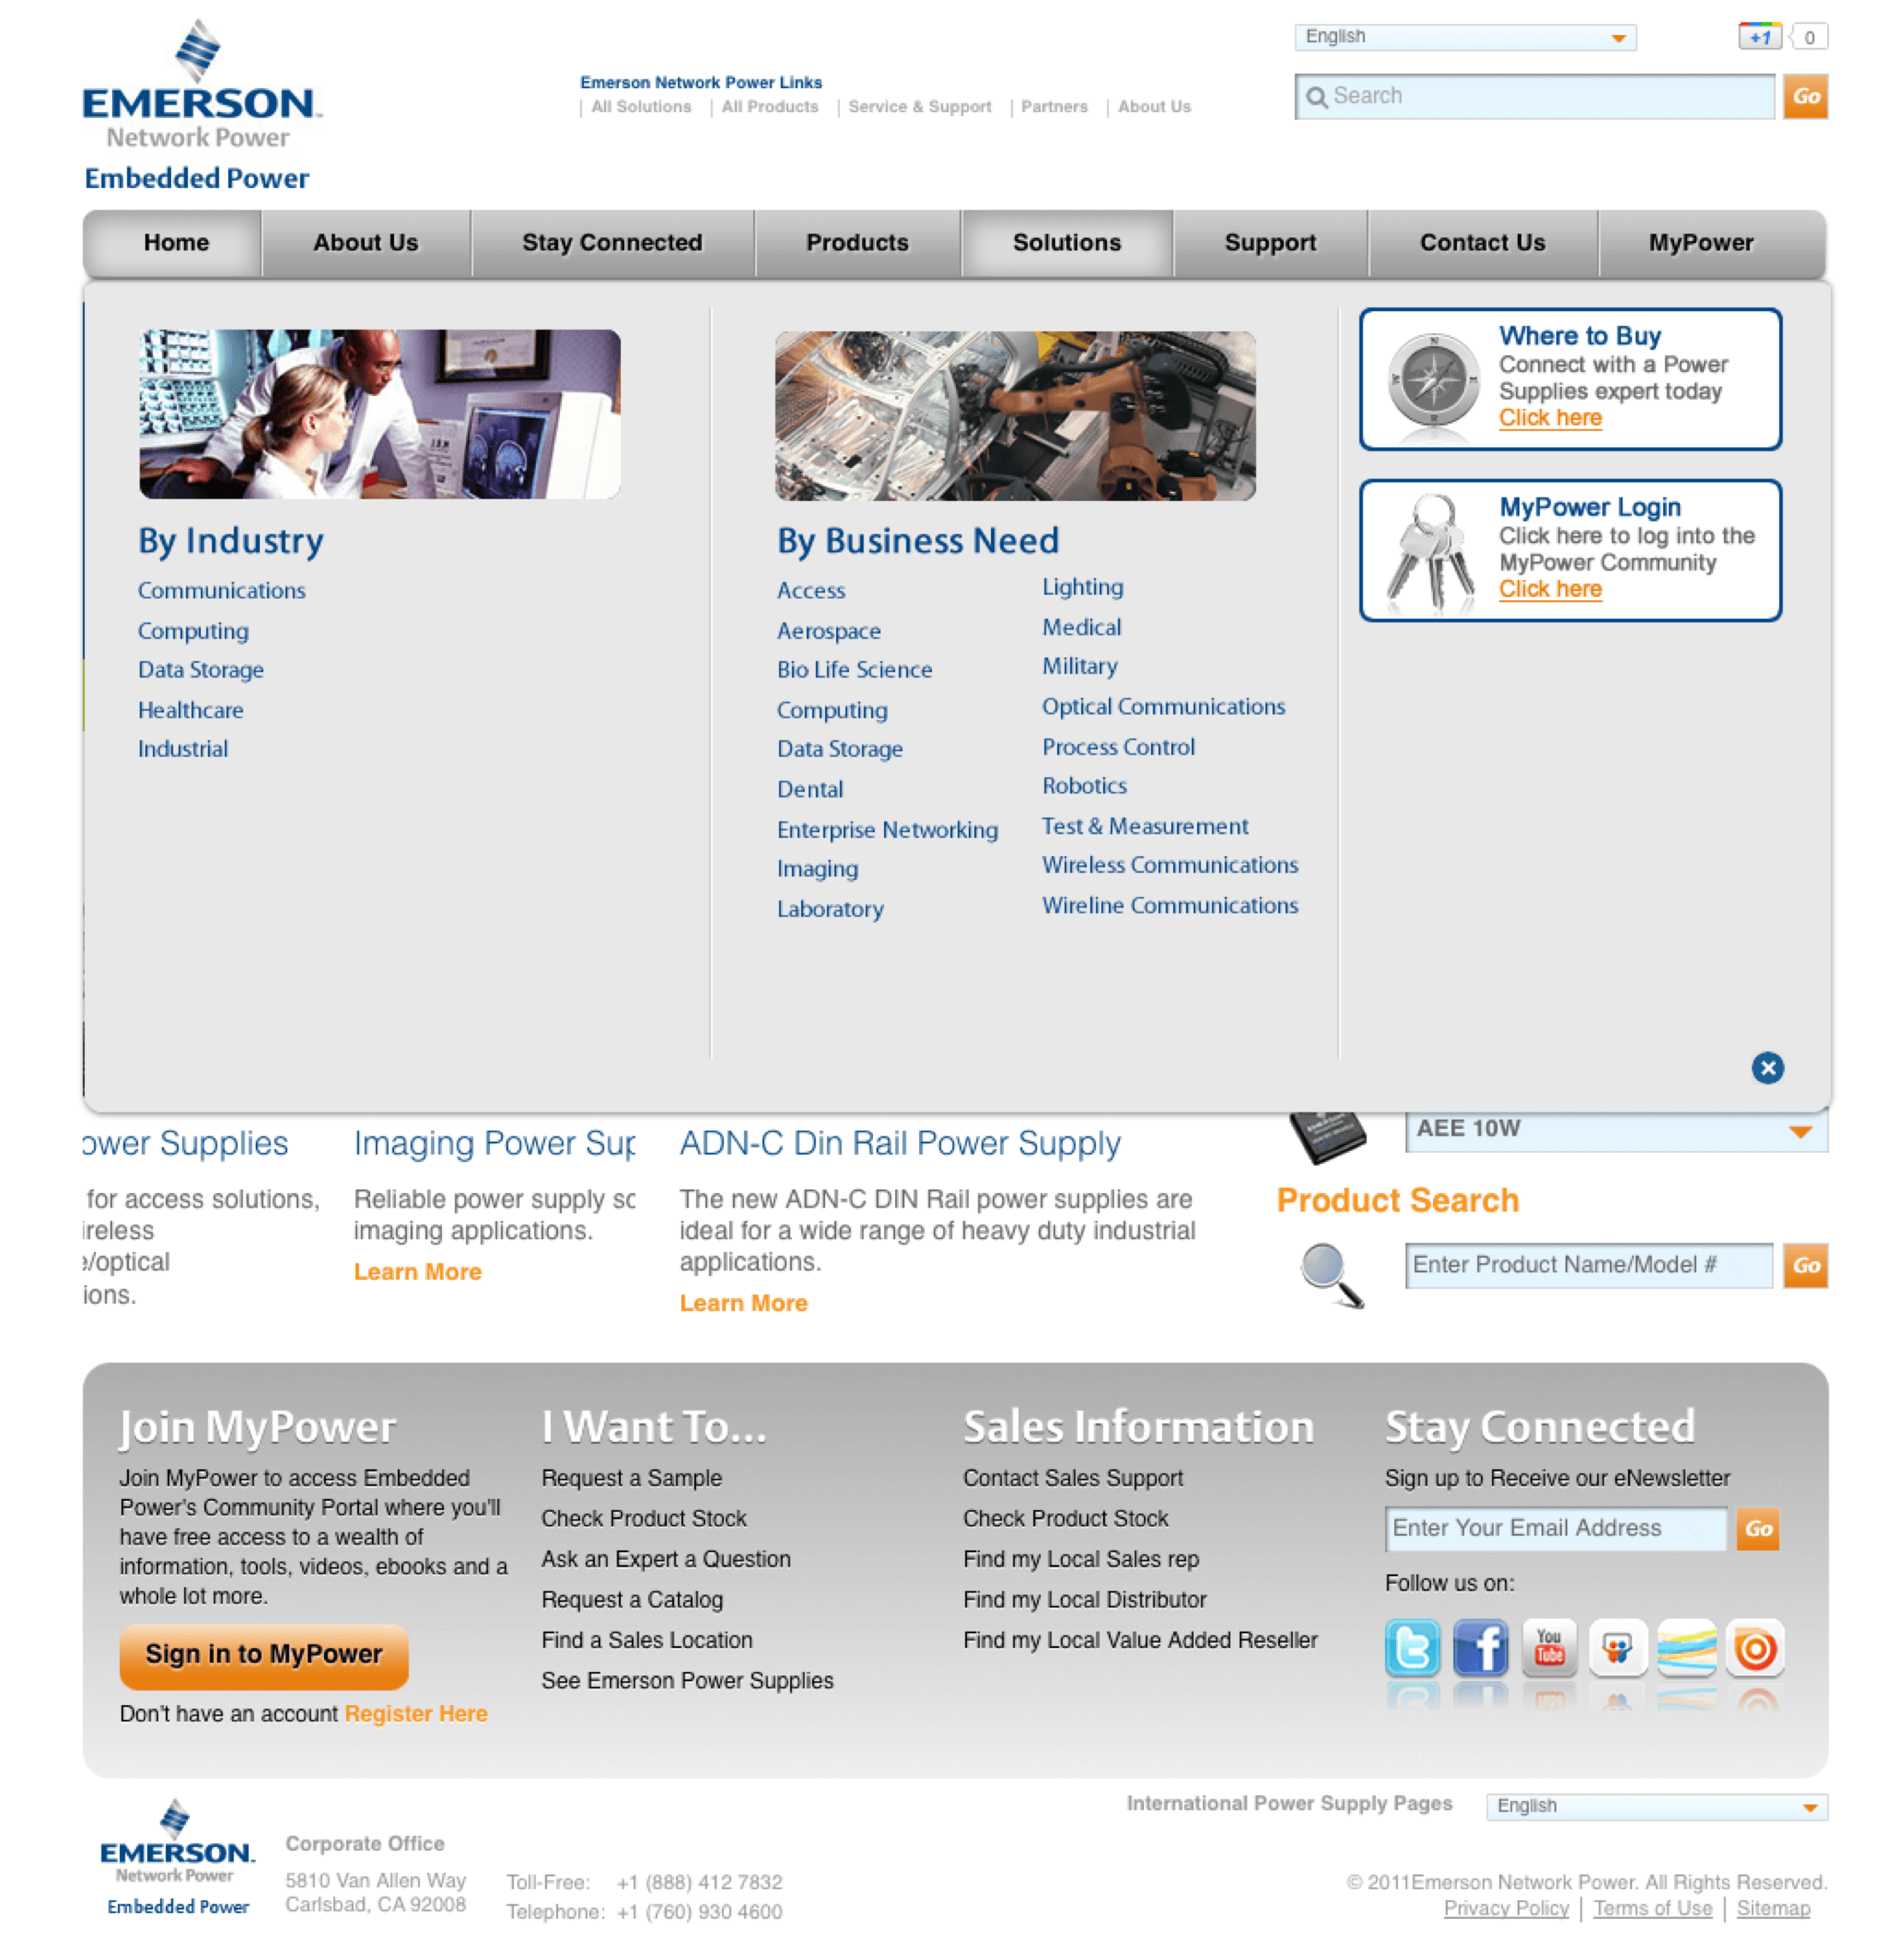 emerson-embedded-ac-dc-power-supplies-website-design-navigation